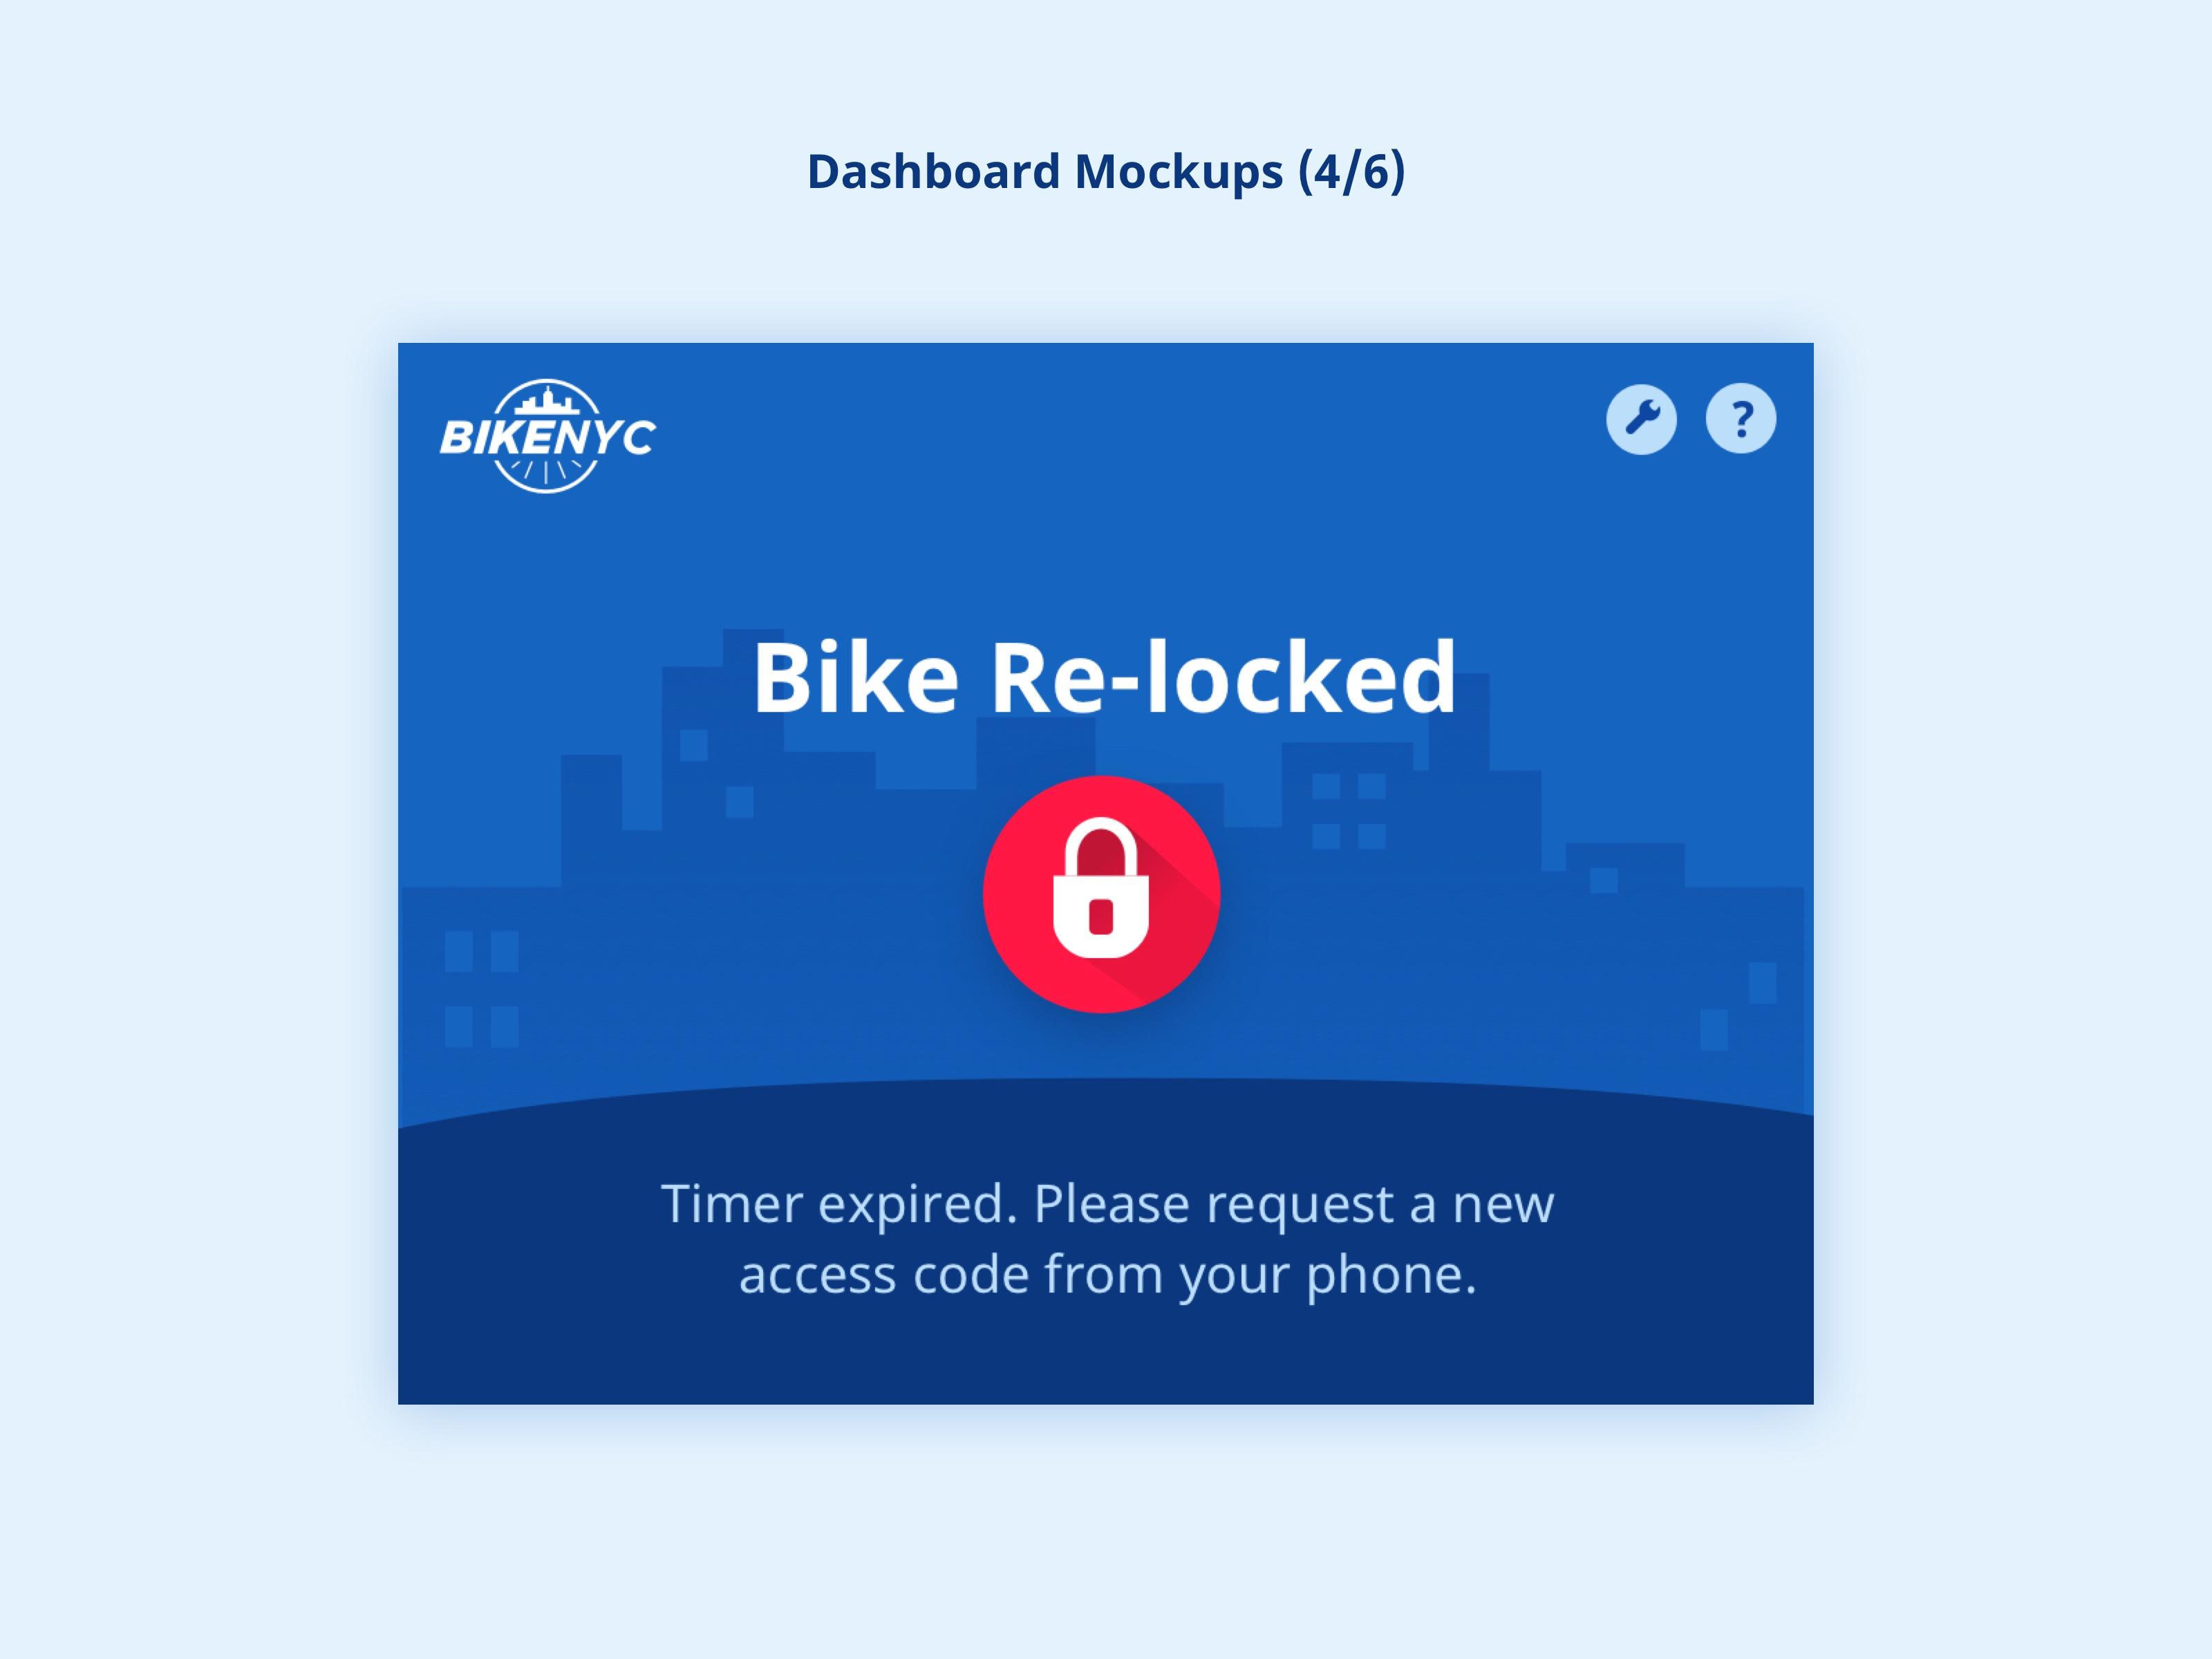 BikeNYC Dashboard - Re-locked